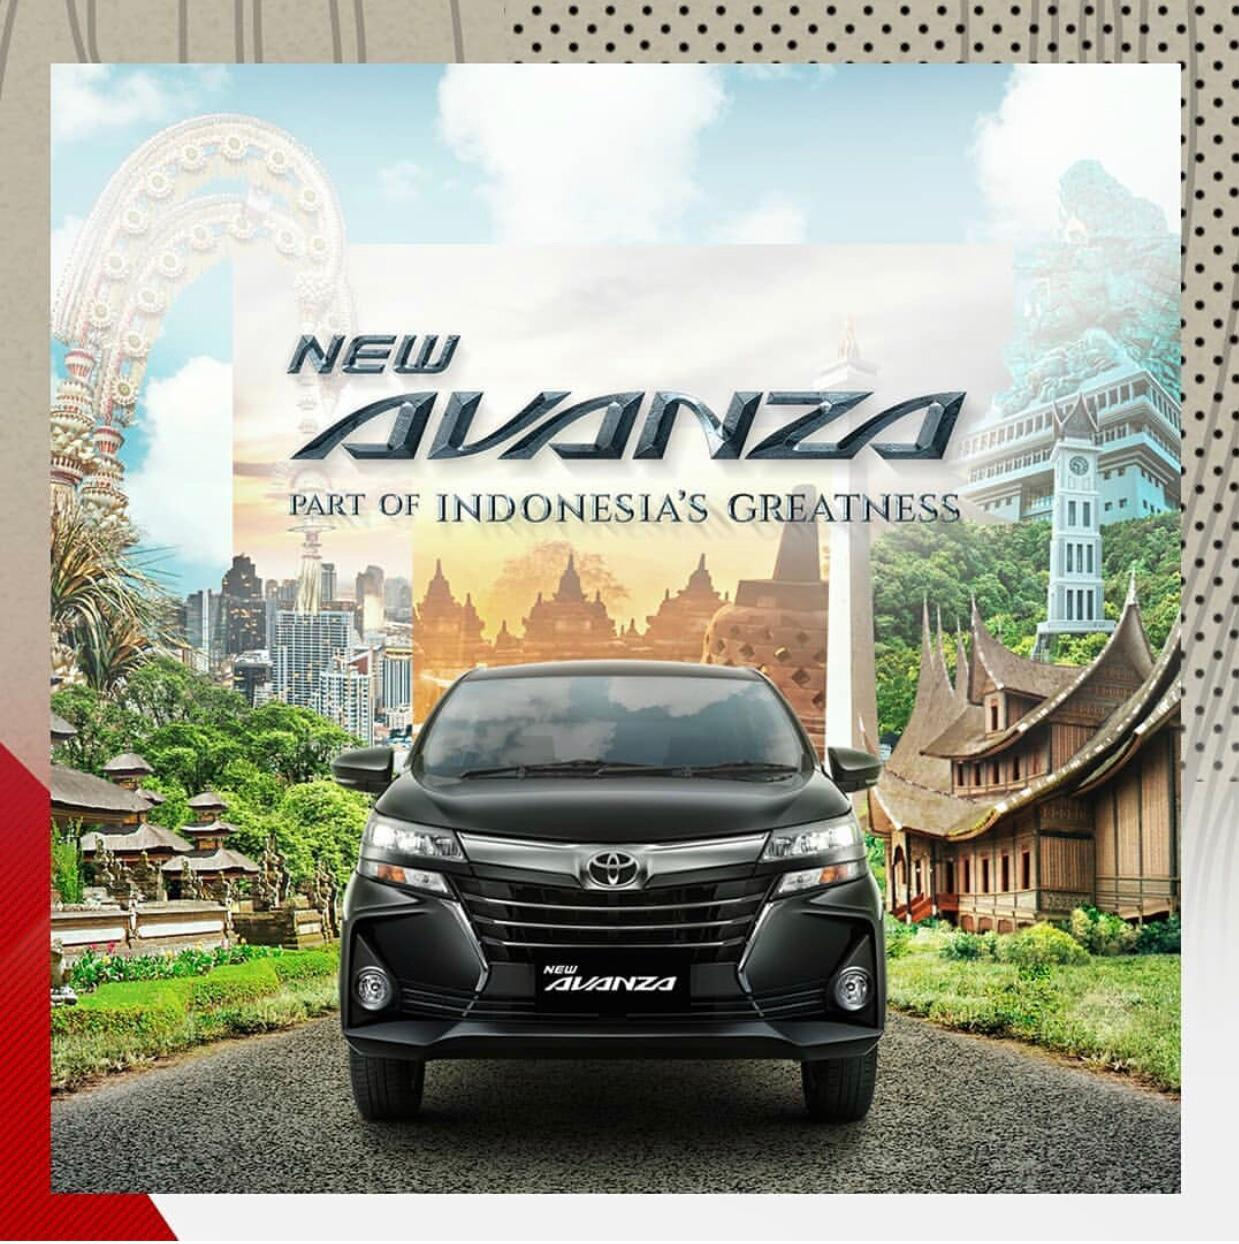 Kekurangan Harga Toyota Avanza Harga